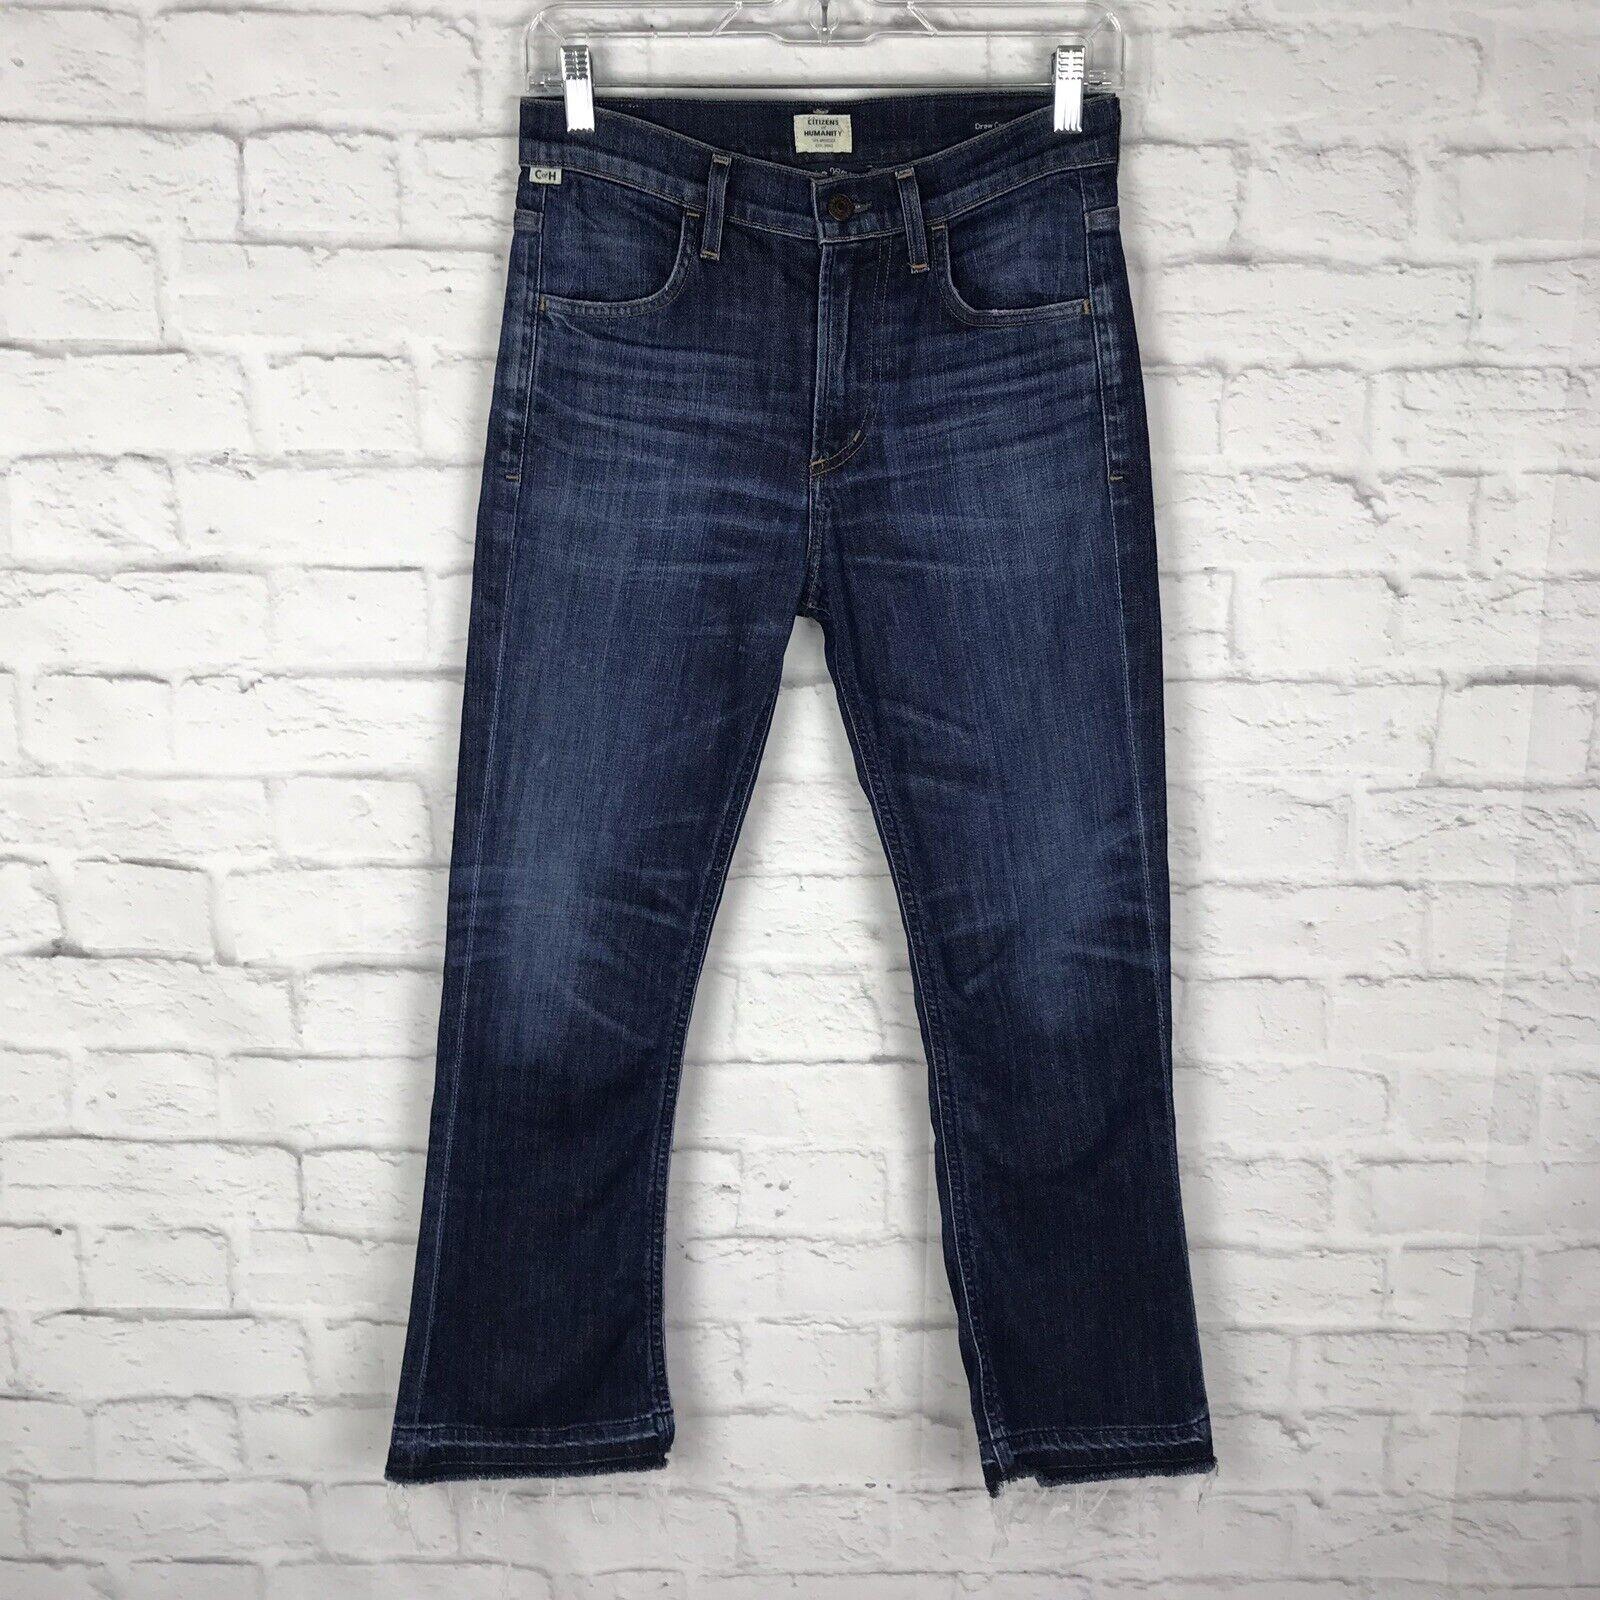 Citizens Of Humanity Womens bluee Denim Sz 24 Drew Capri Medium Wash Fringe Jeans